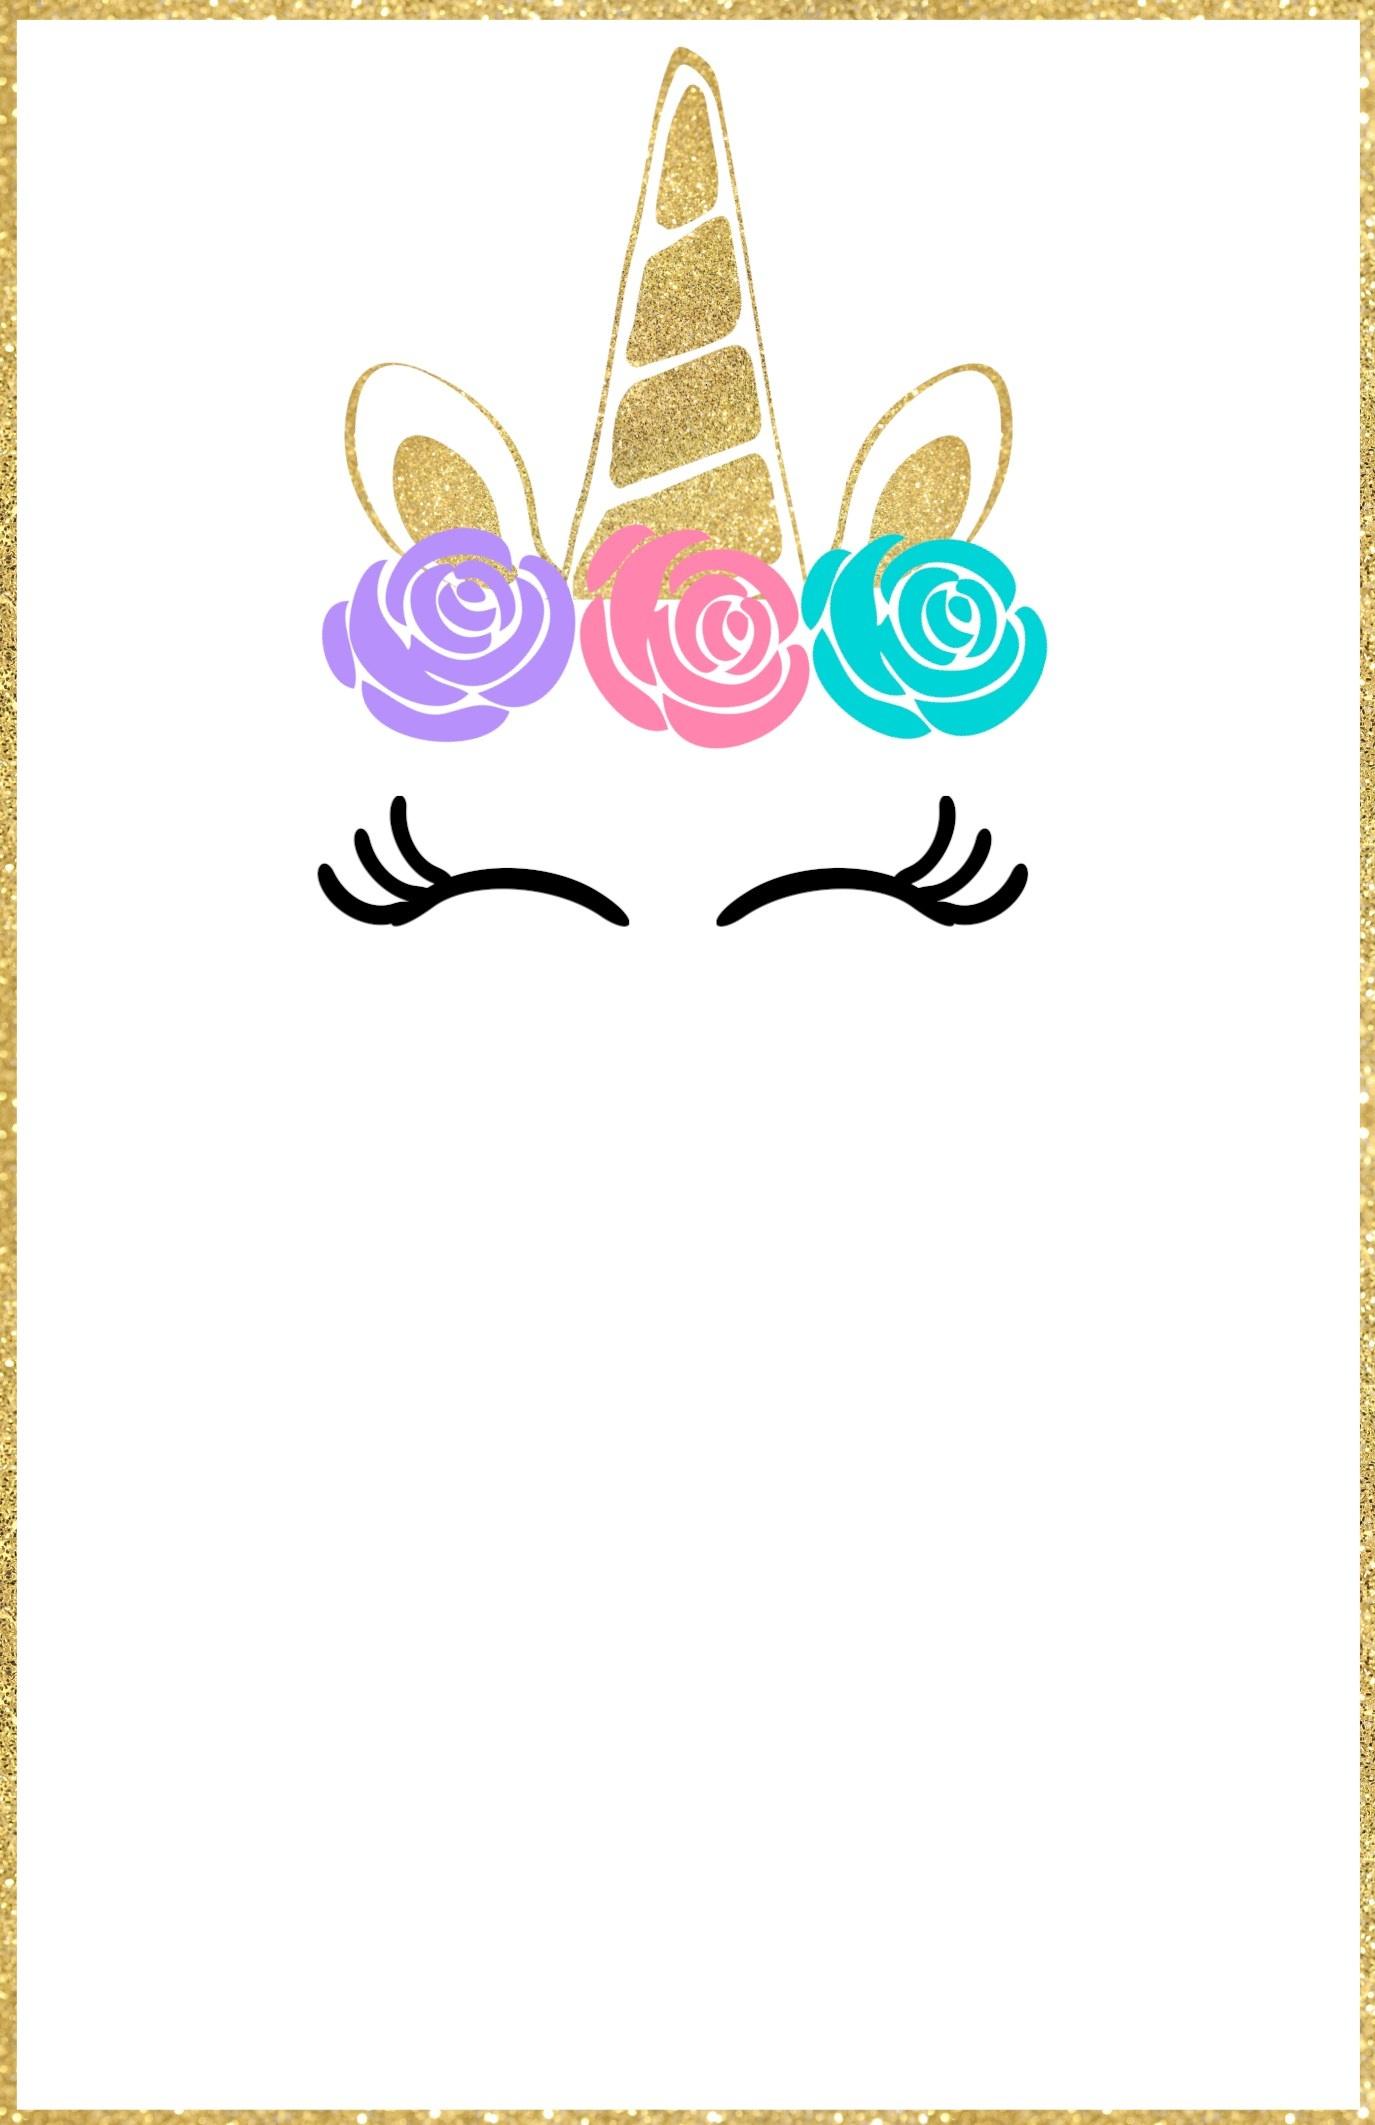 Free Printable Unicorn Invitations Template - Paper Trail Design - Free Unicorn Party Printables